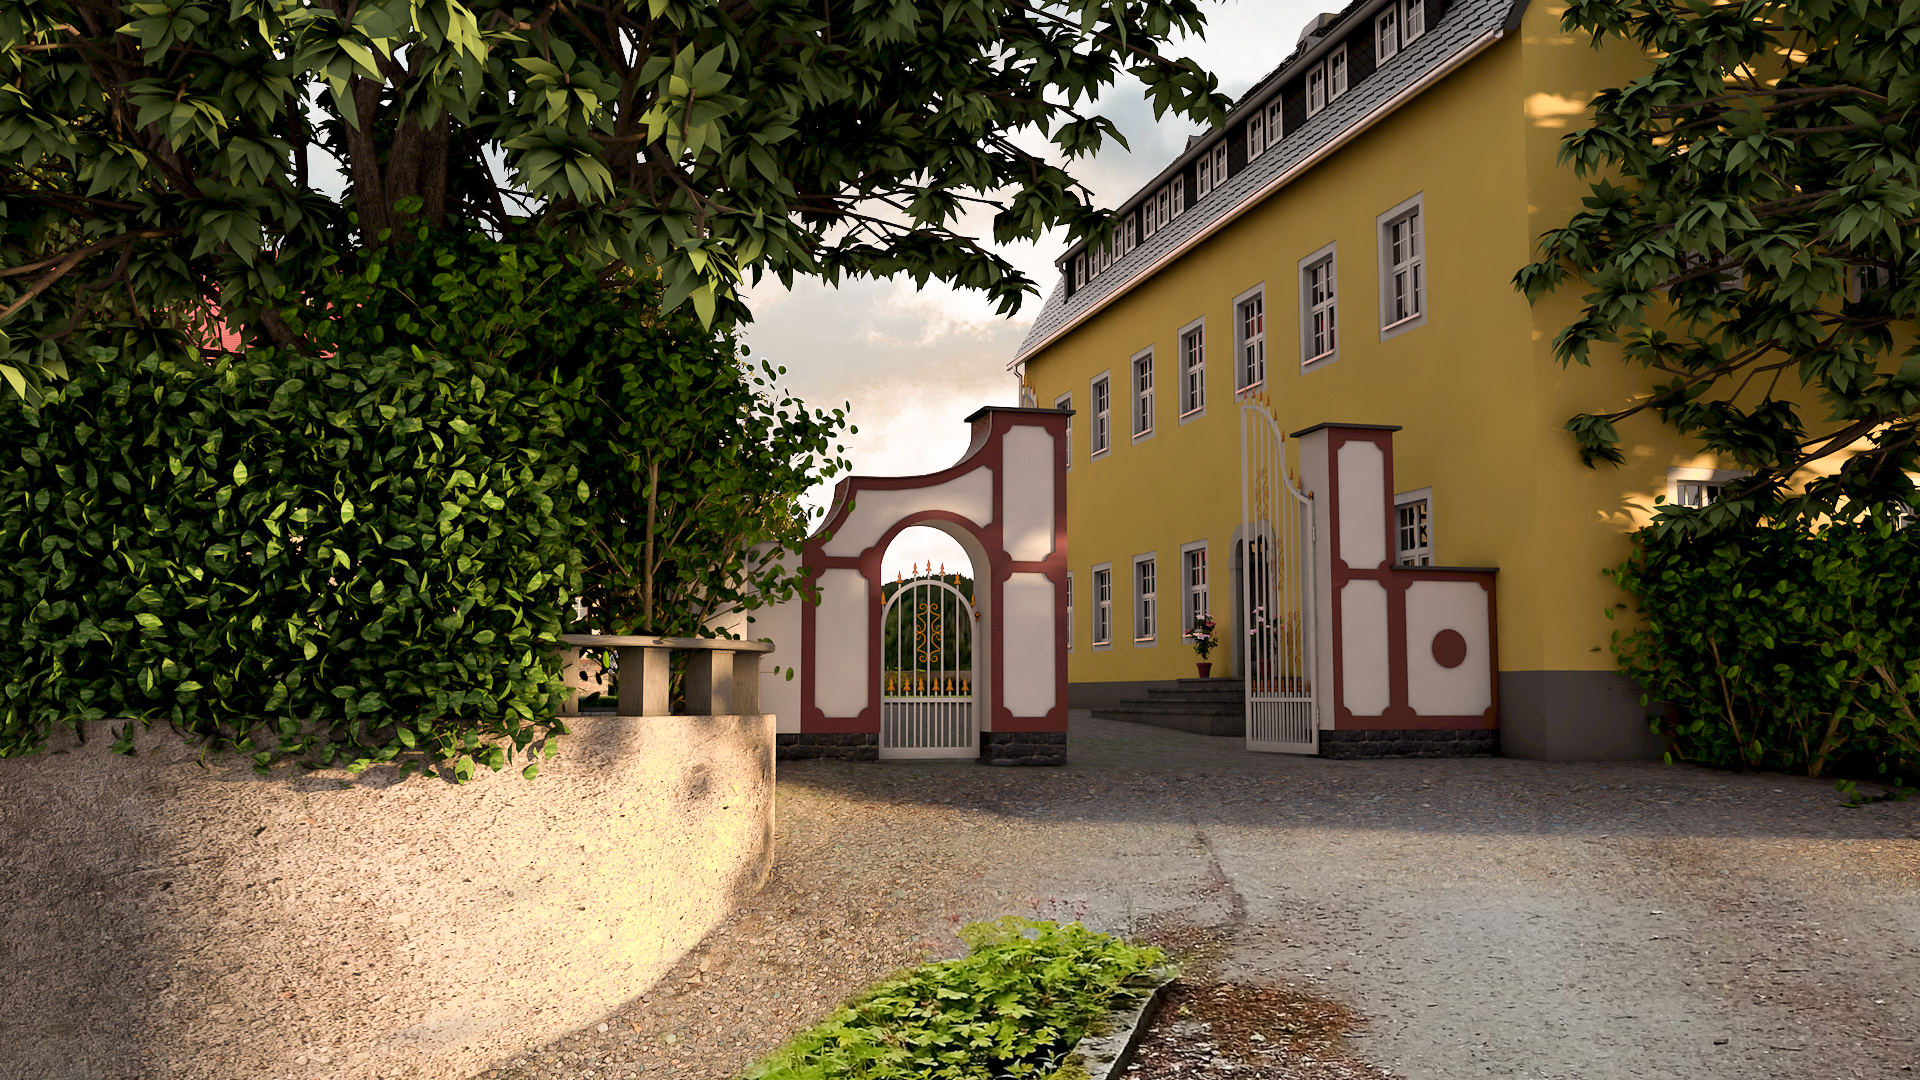 Schloss-Eingang1_ohne_Rahmen